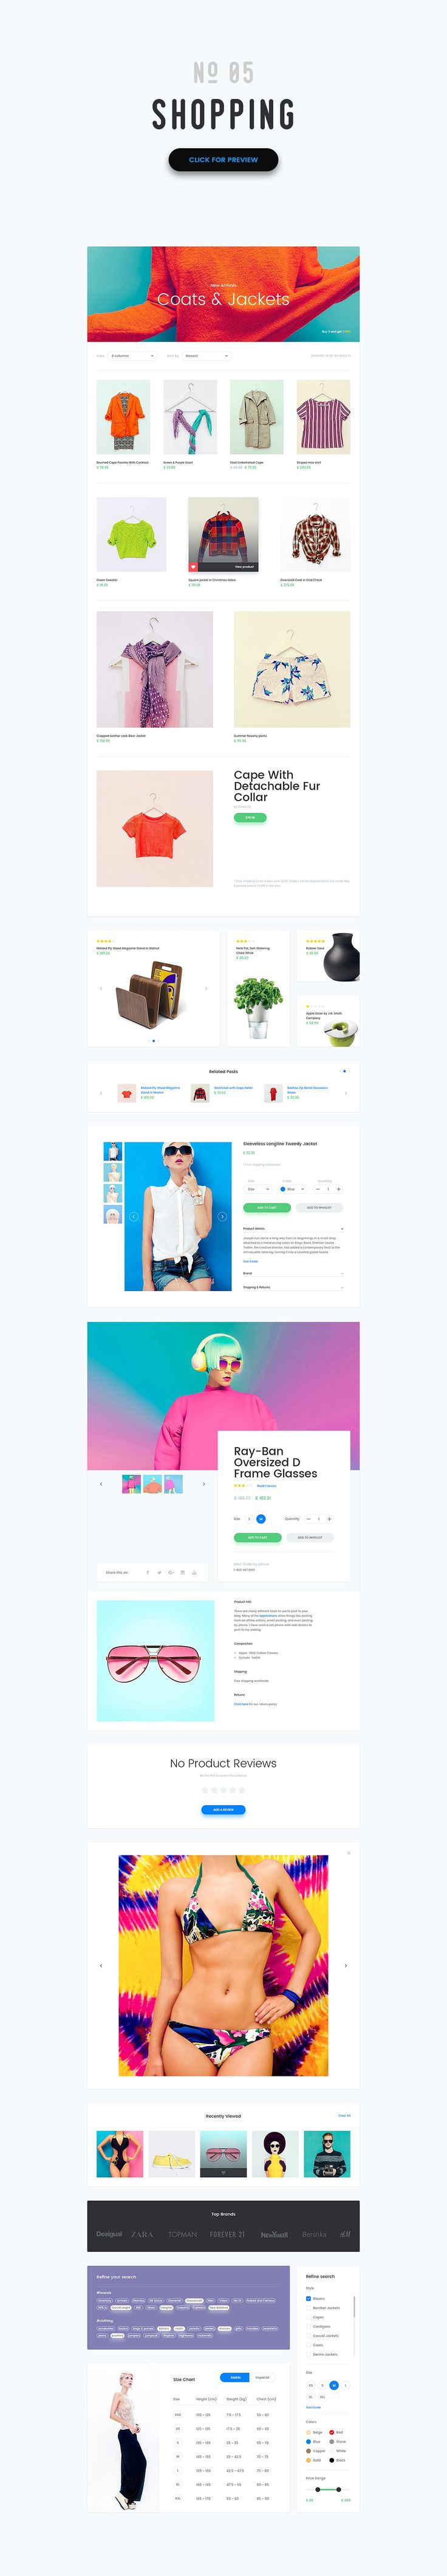 -50%- Vivid - Soft Material UI Kit - Web Elements - 8